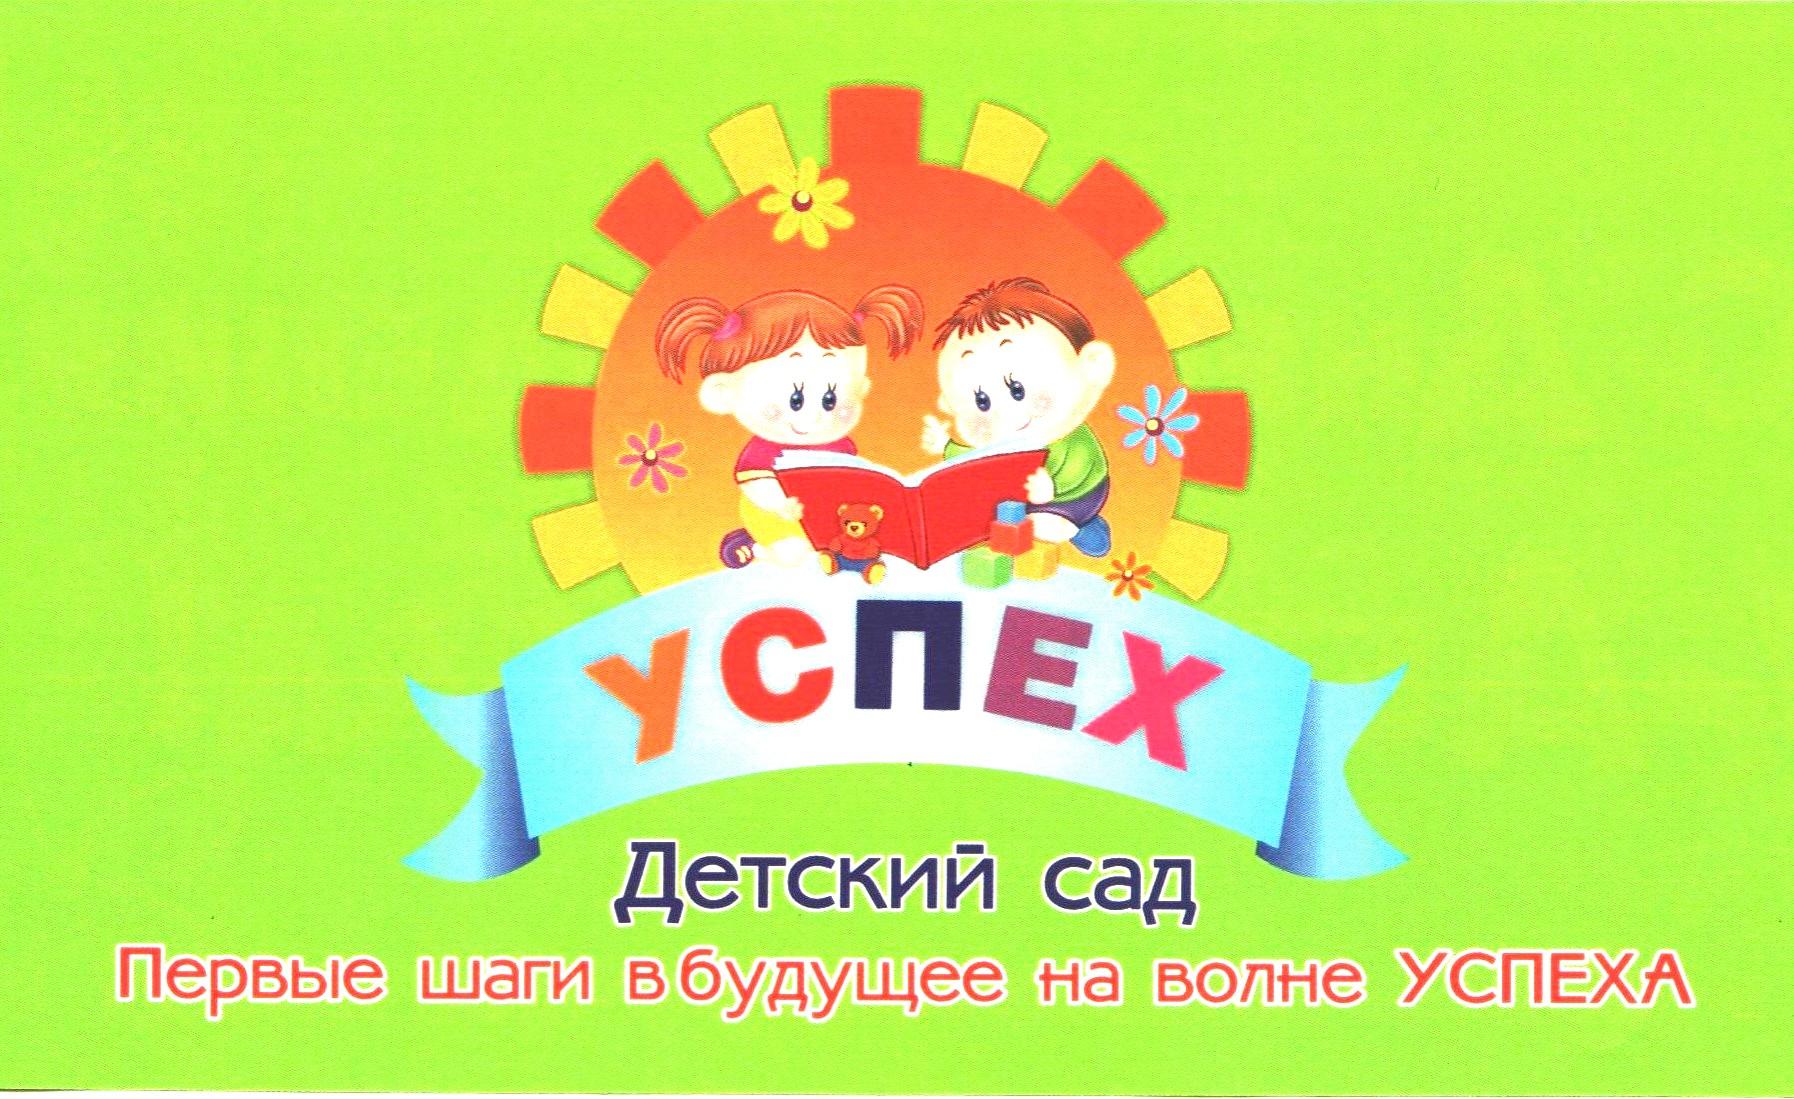 МКДОУ №11 г. Кирова